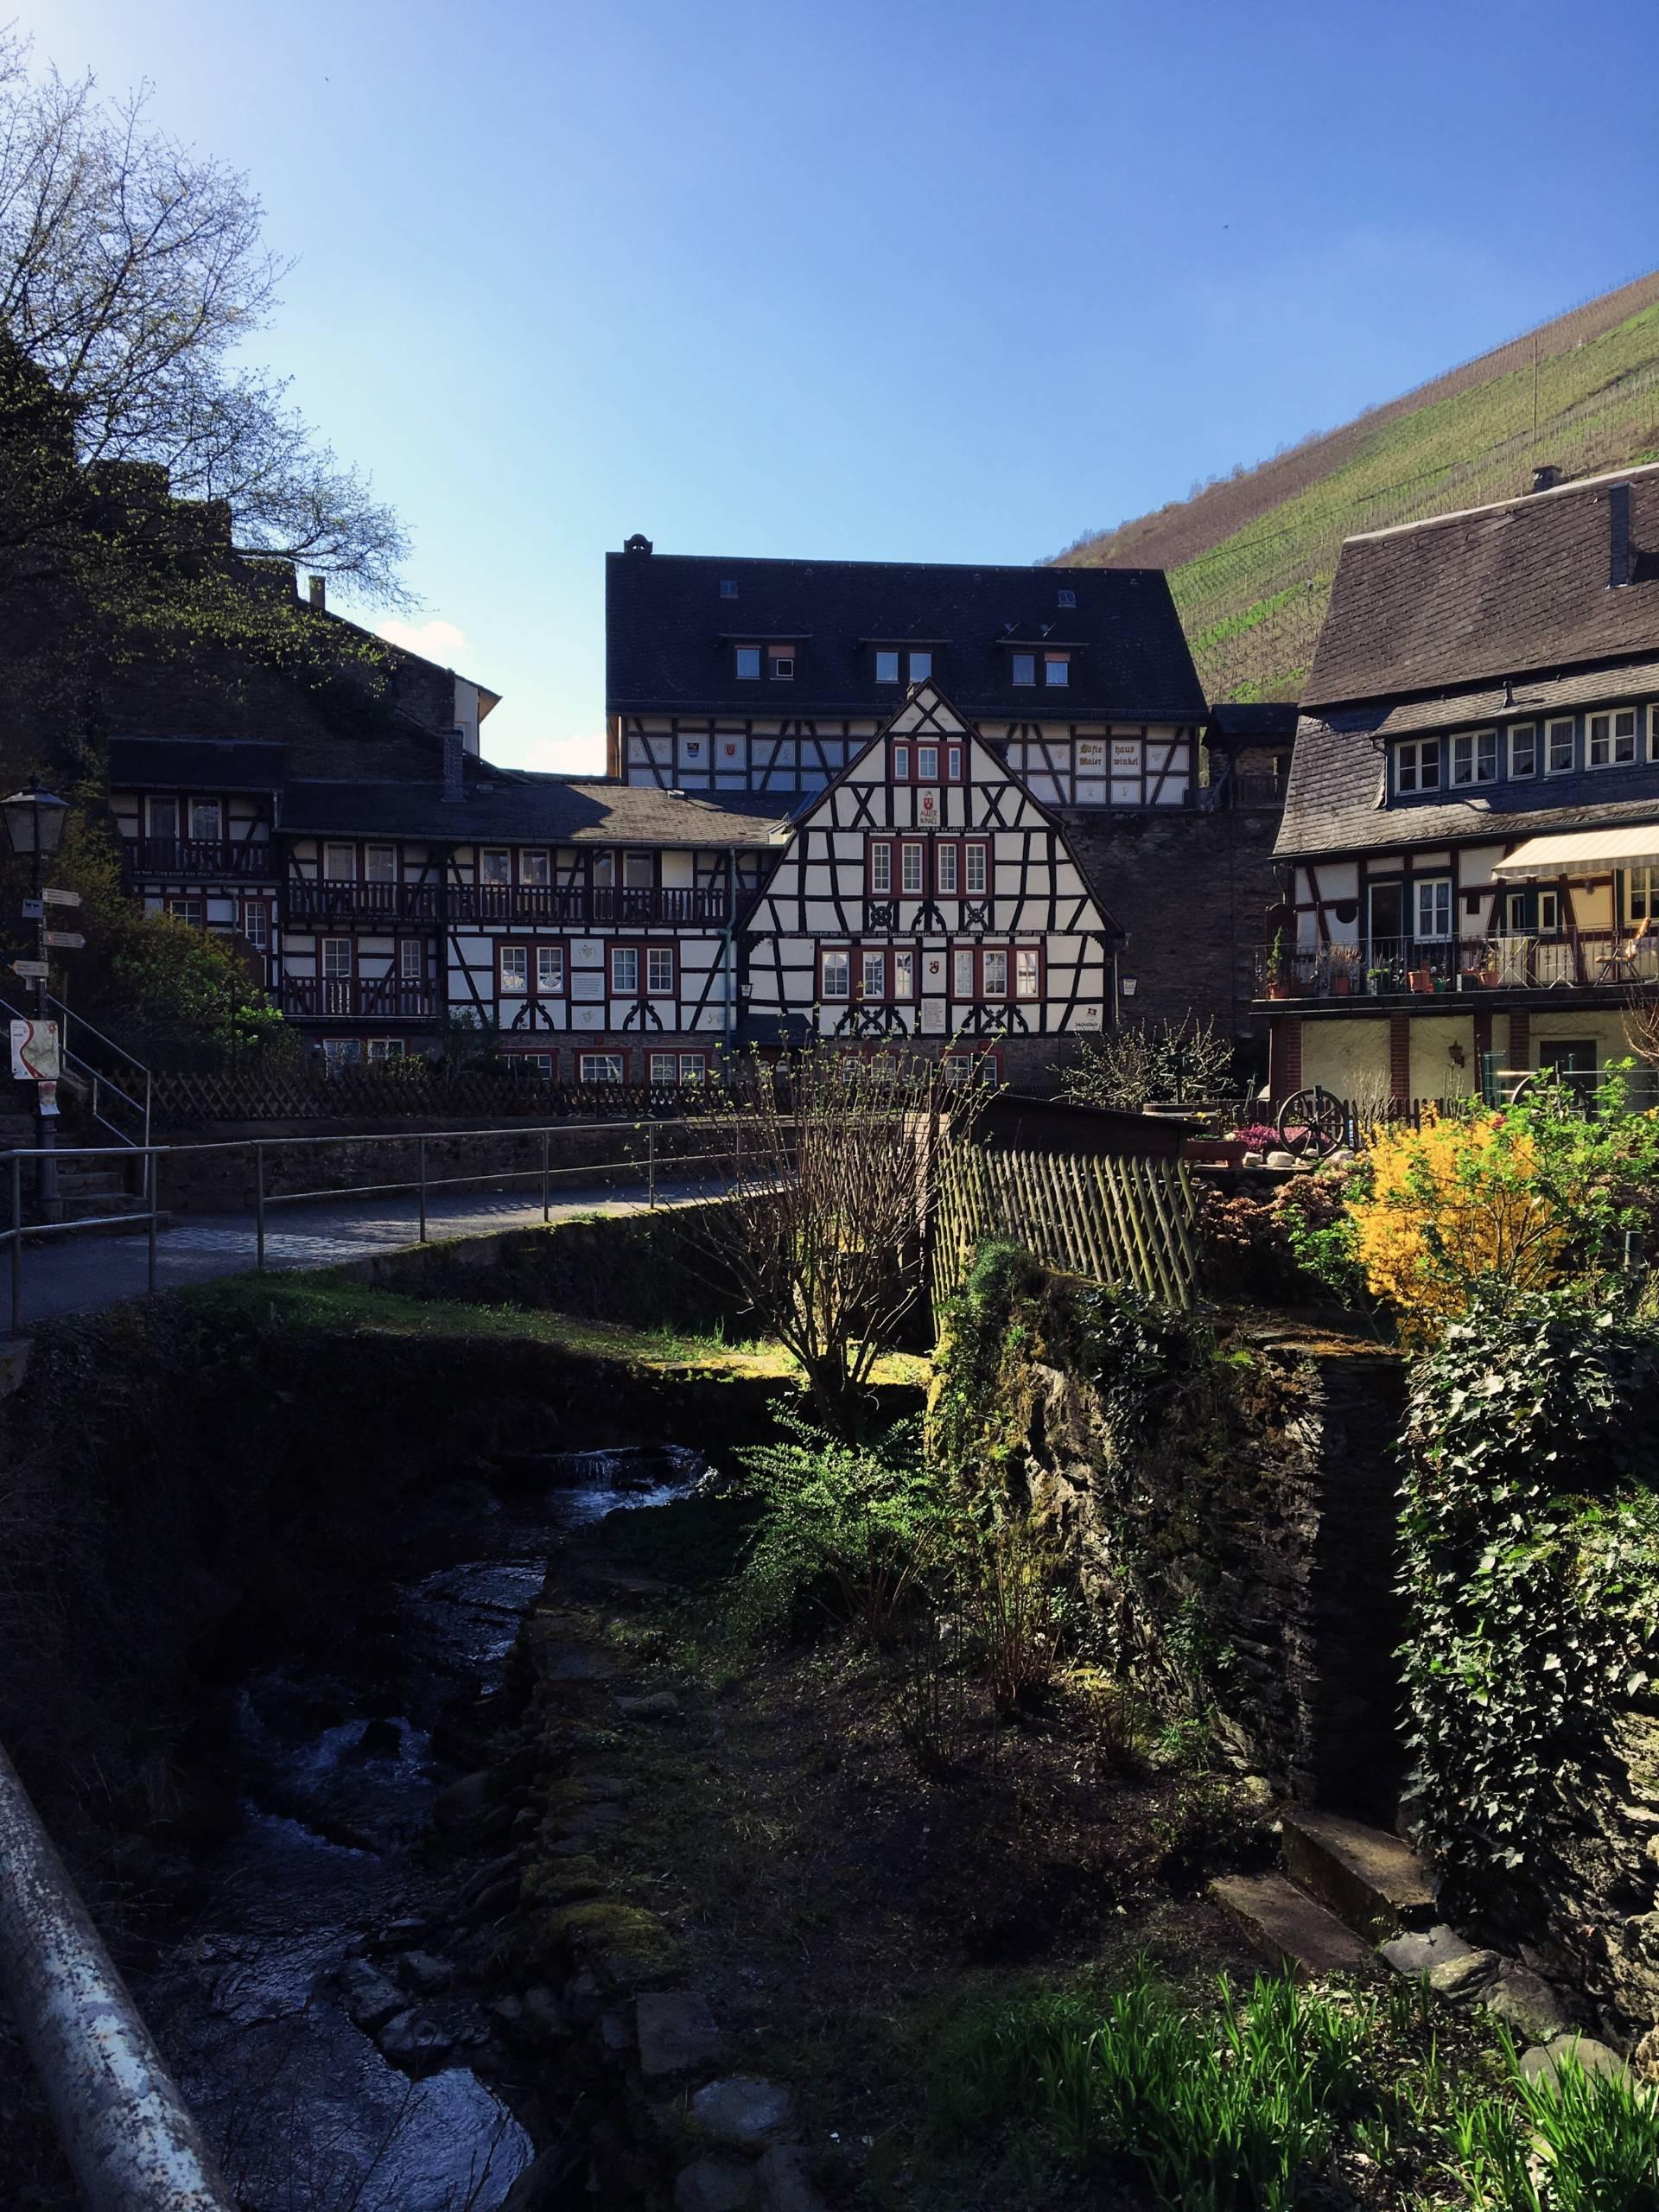 Fairytale Houses in St Goar Germany